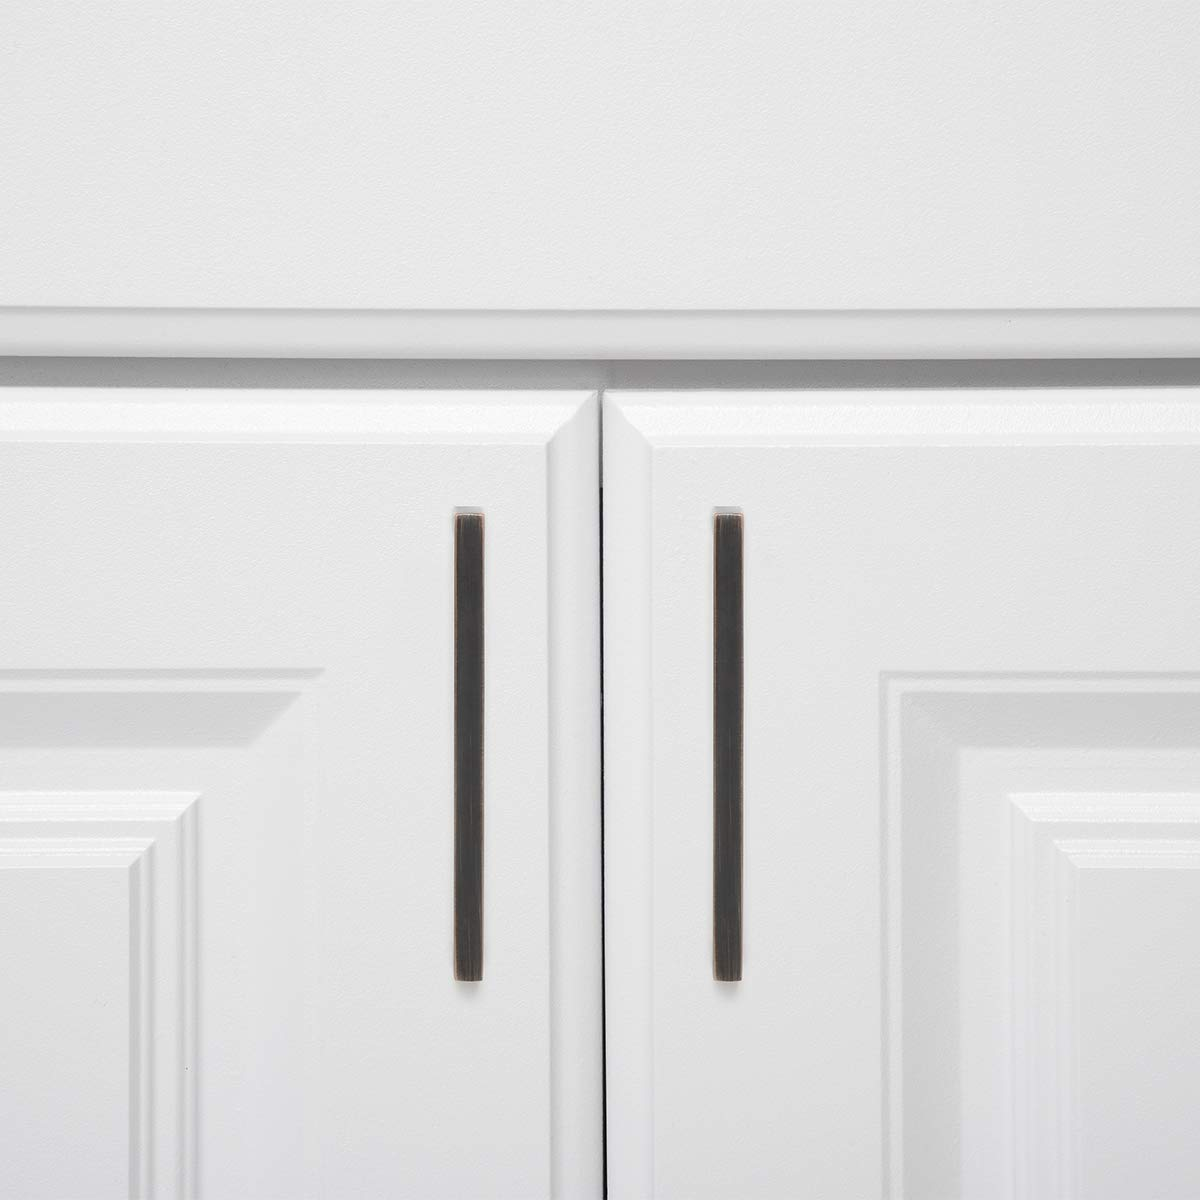 4.13 Length Basics AB3701-AB-10 Cabinet Pull 3.75 Hole Center Antique Brass